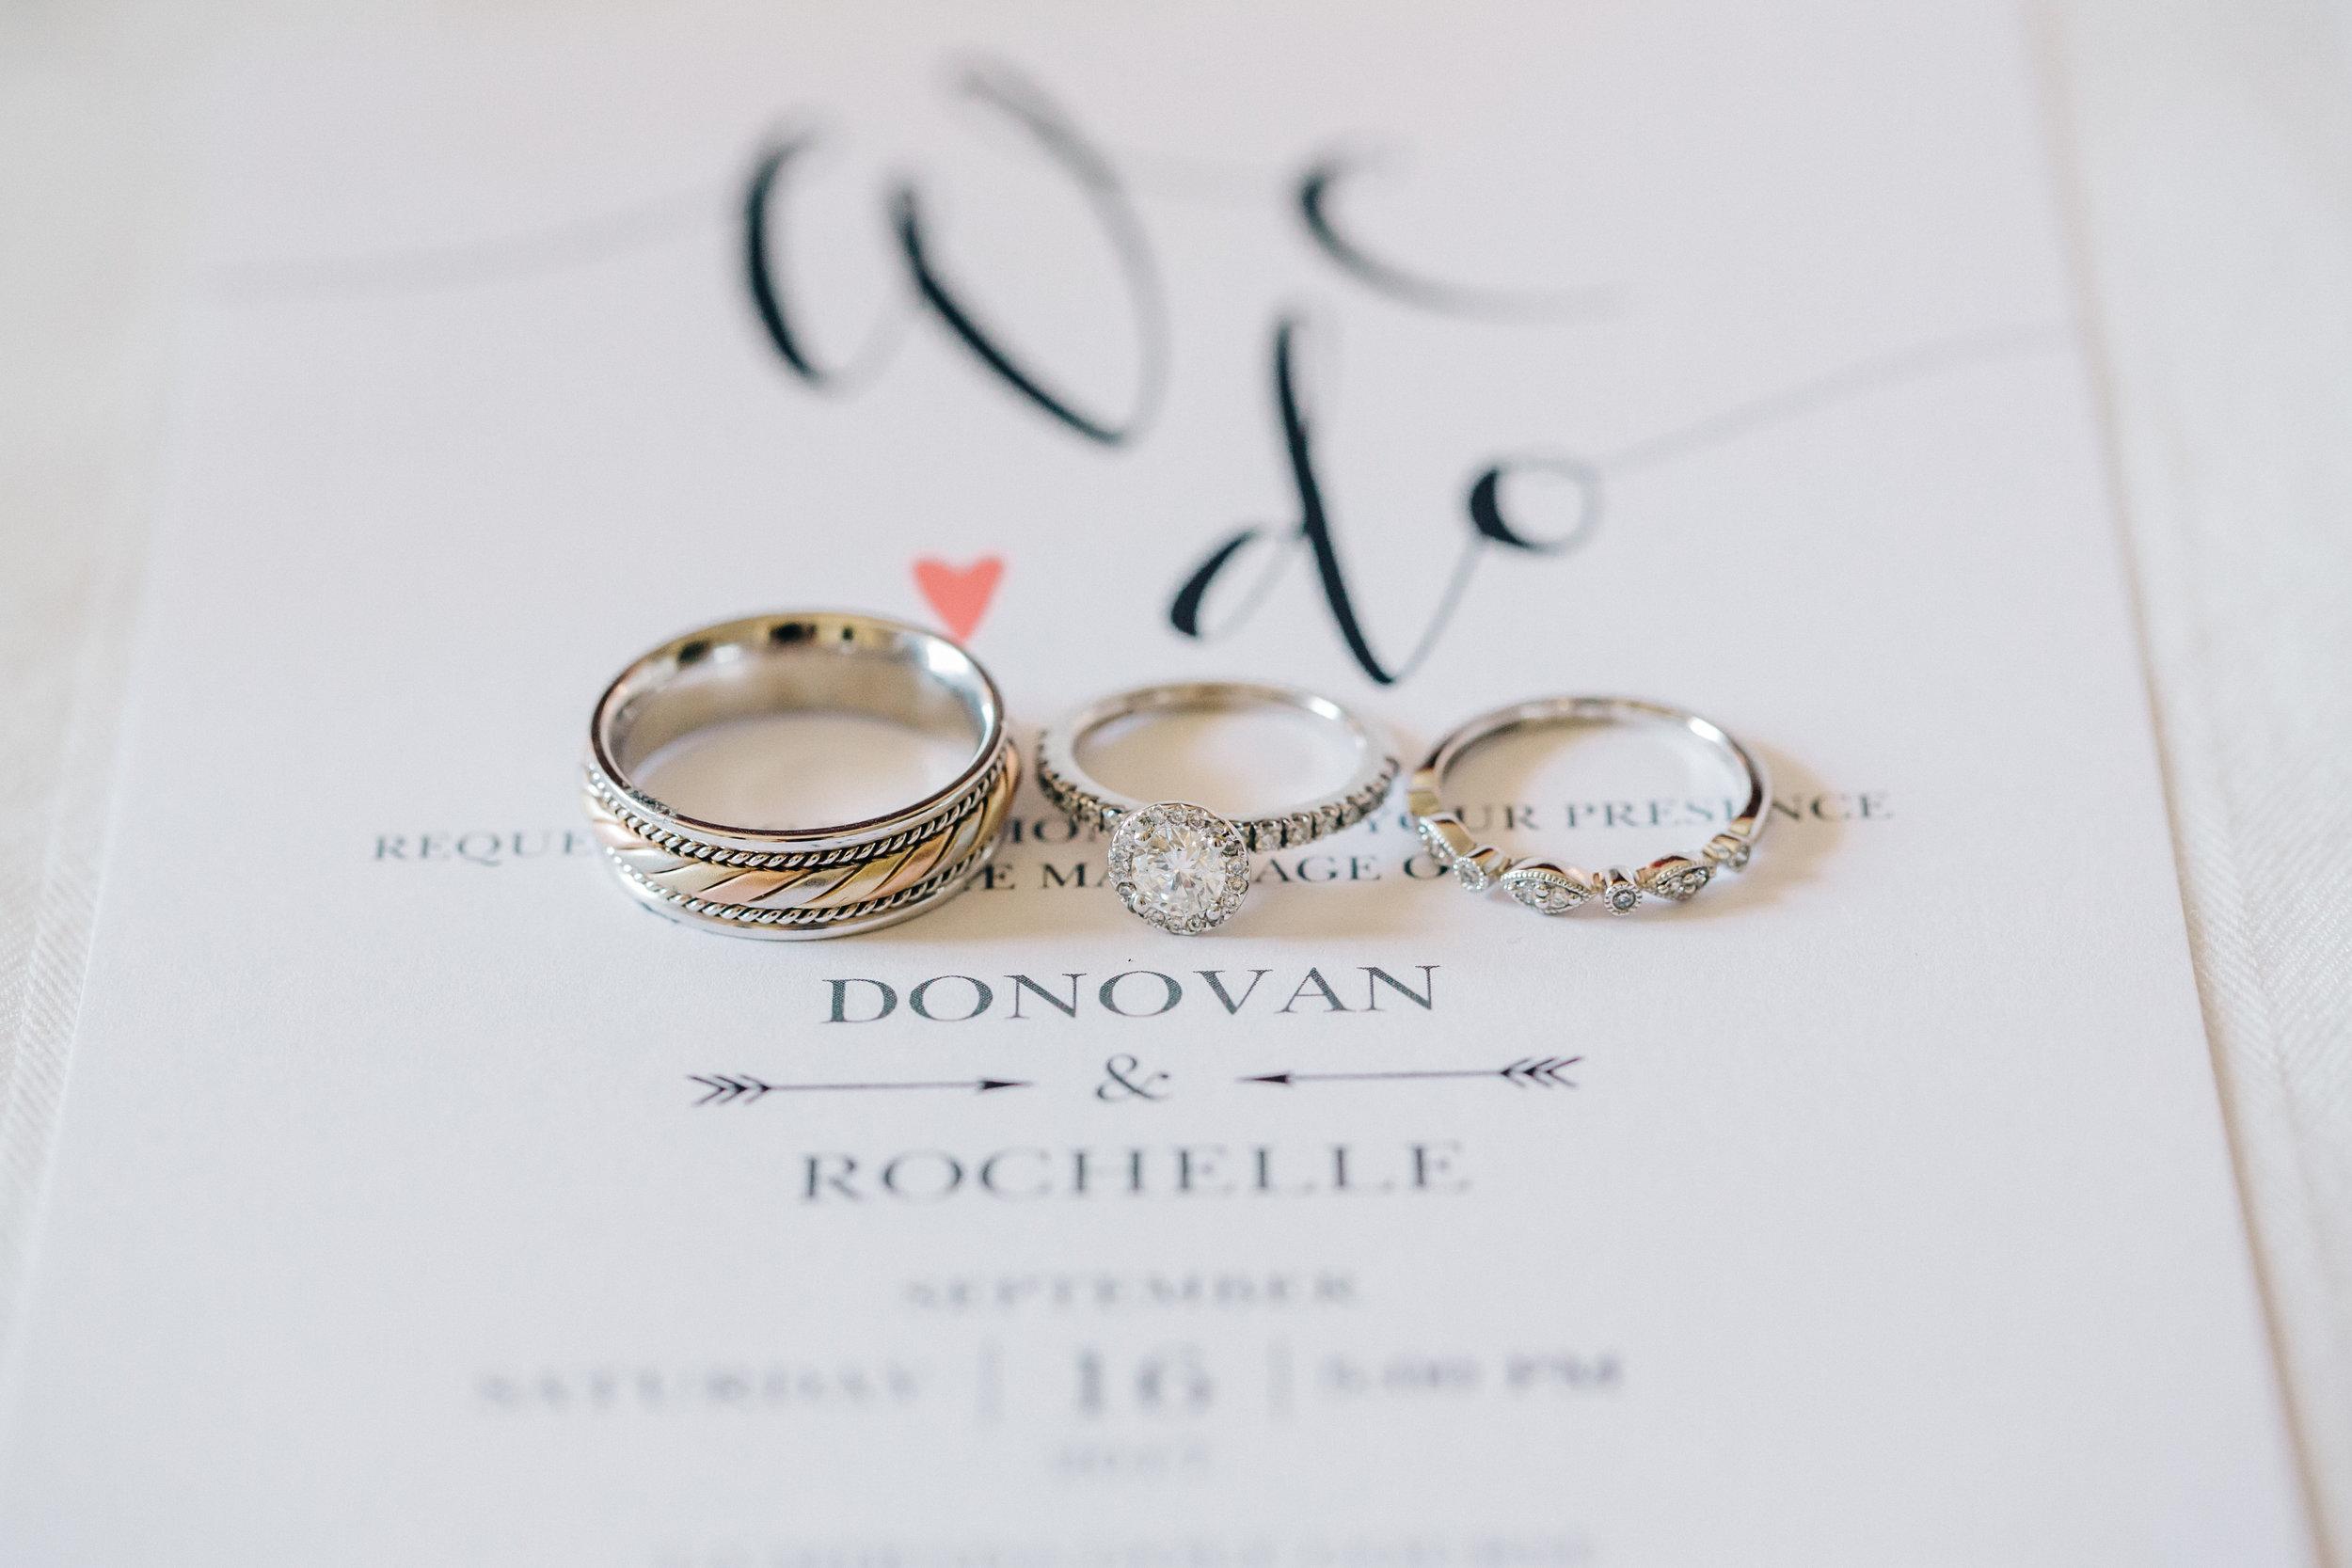 Rochelle & Donovan_0003.jpg